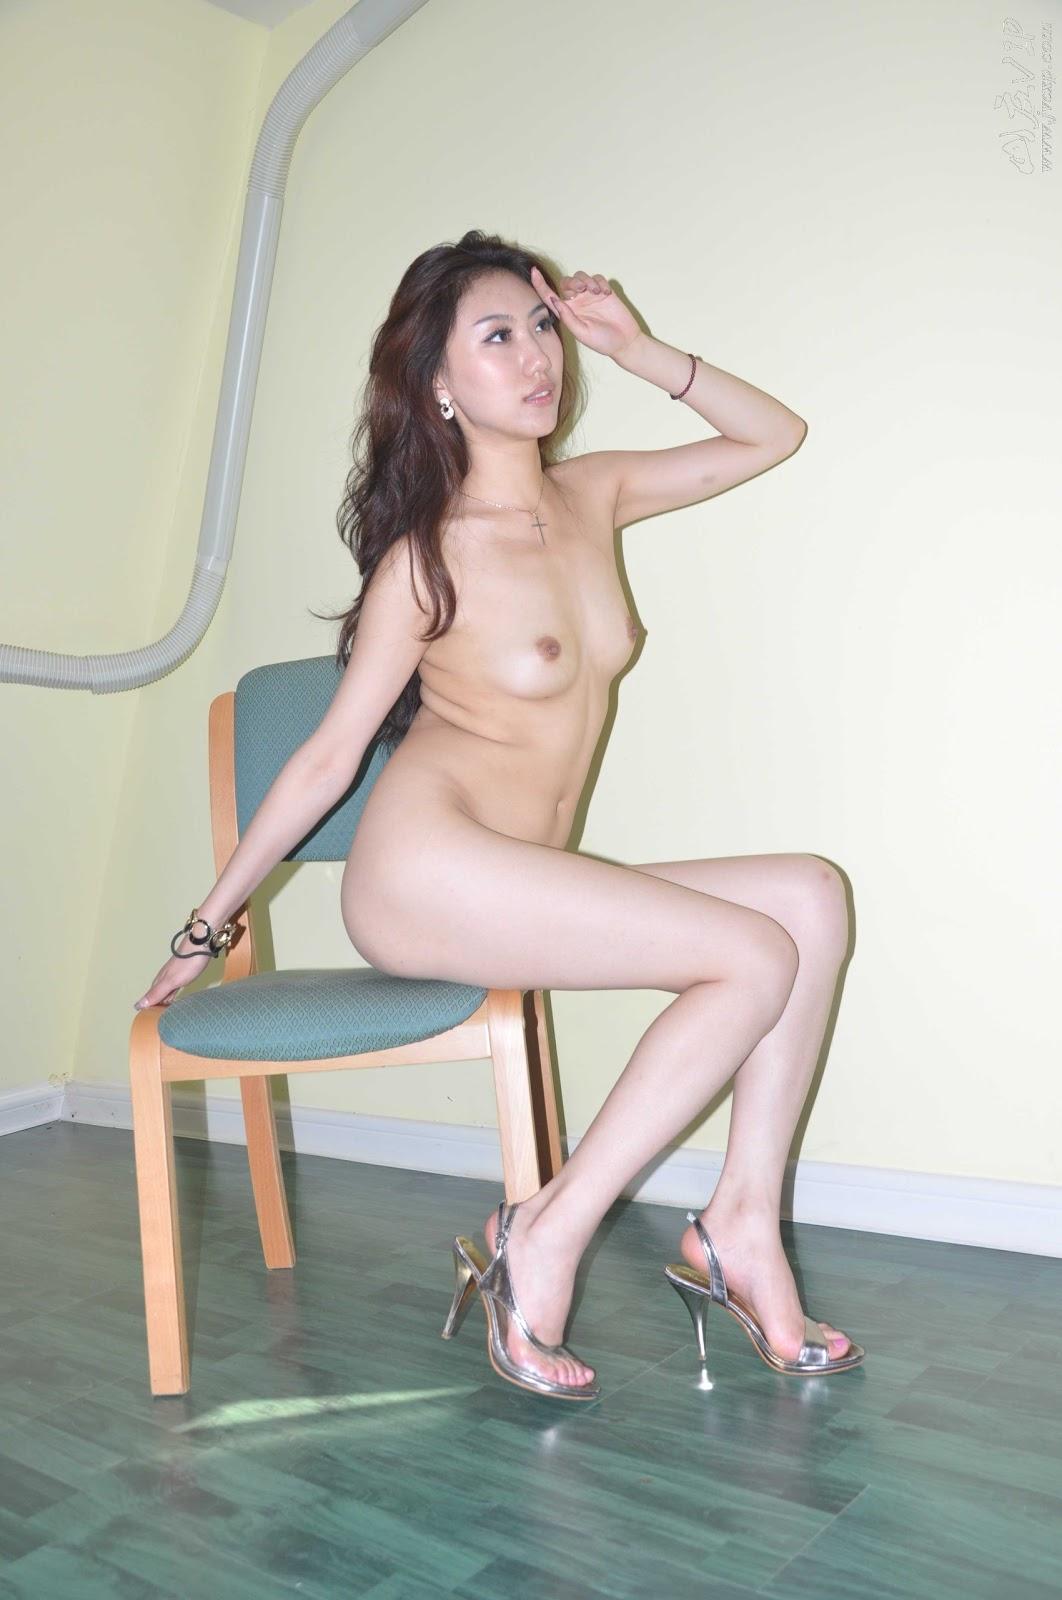 http://4.bp.blogspot.com/_flCG3ABq_jQ/TVJiWZlwUlI/AAAAAAAAADg/uXe_wQbjifM/s1600/World+Supermodel+Contest+China+Winner+Leaked+Nude+Photos+www.GutterUncensoredPlus.com+242.jpg